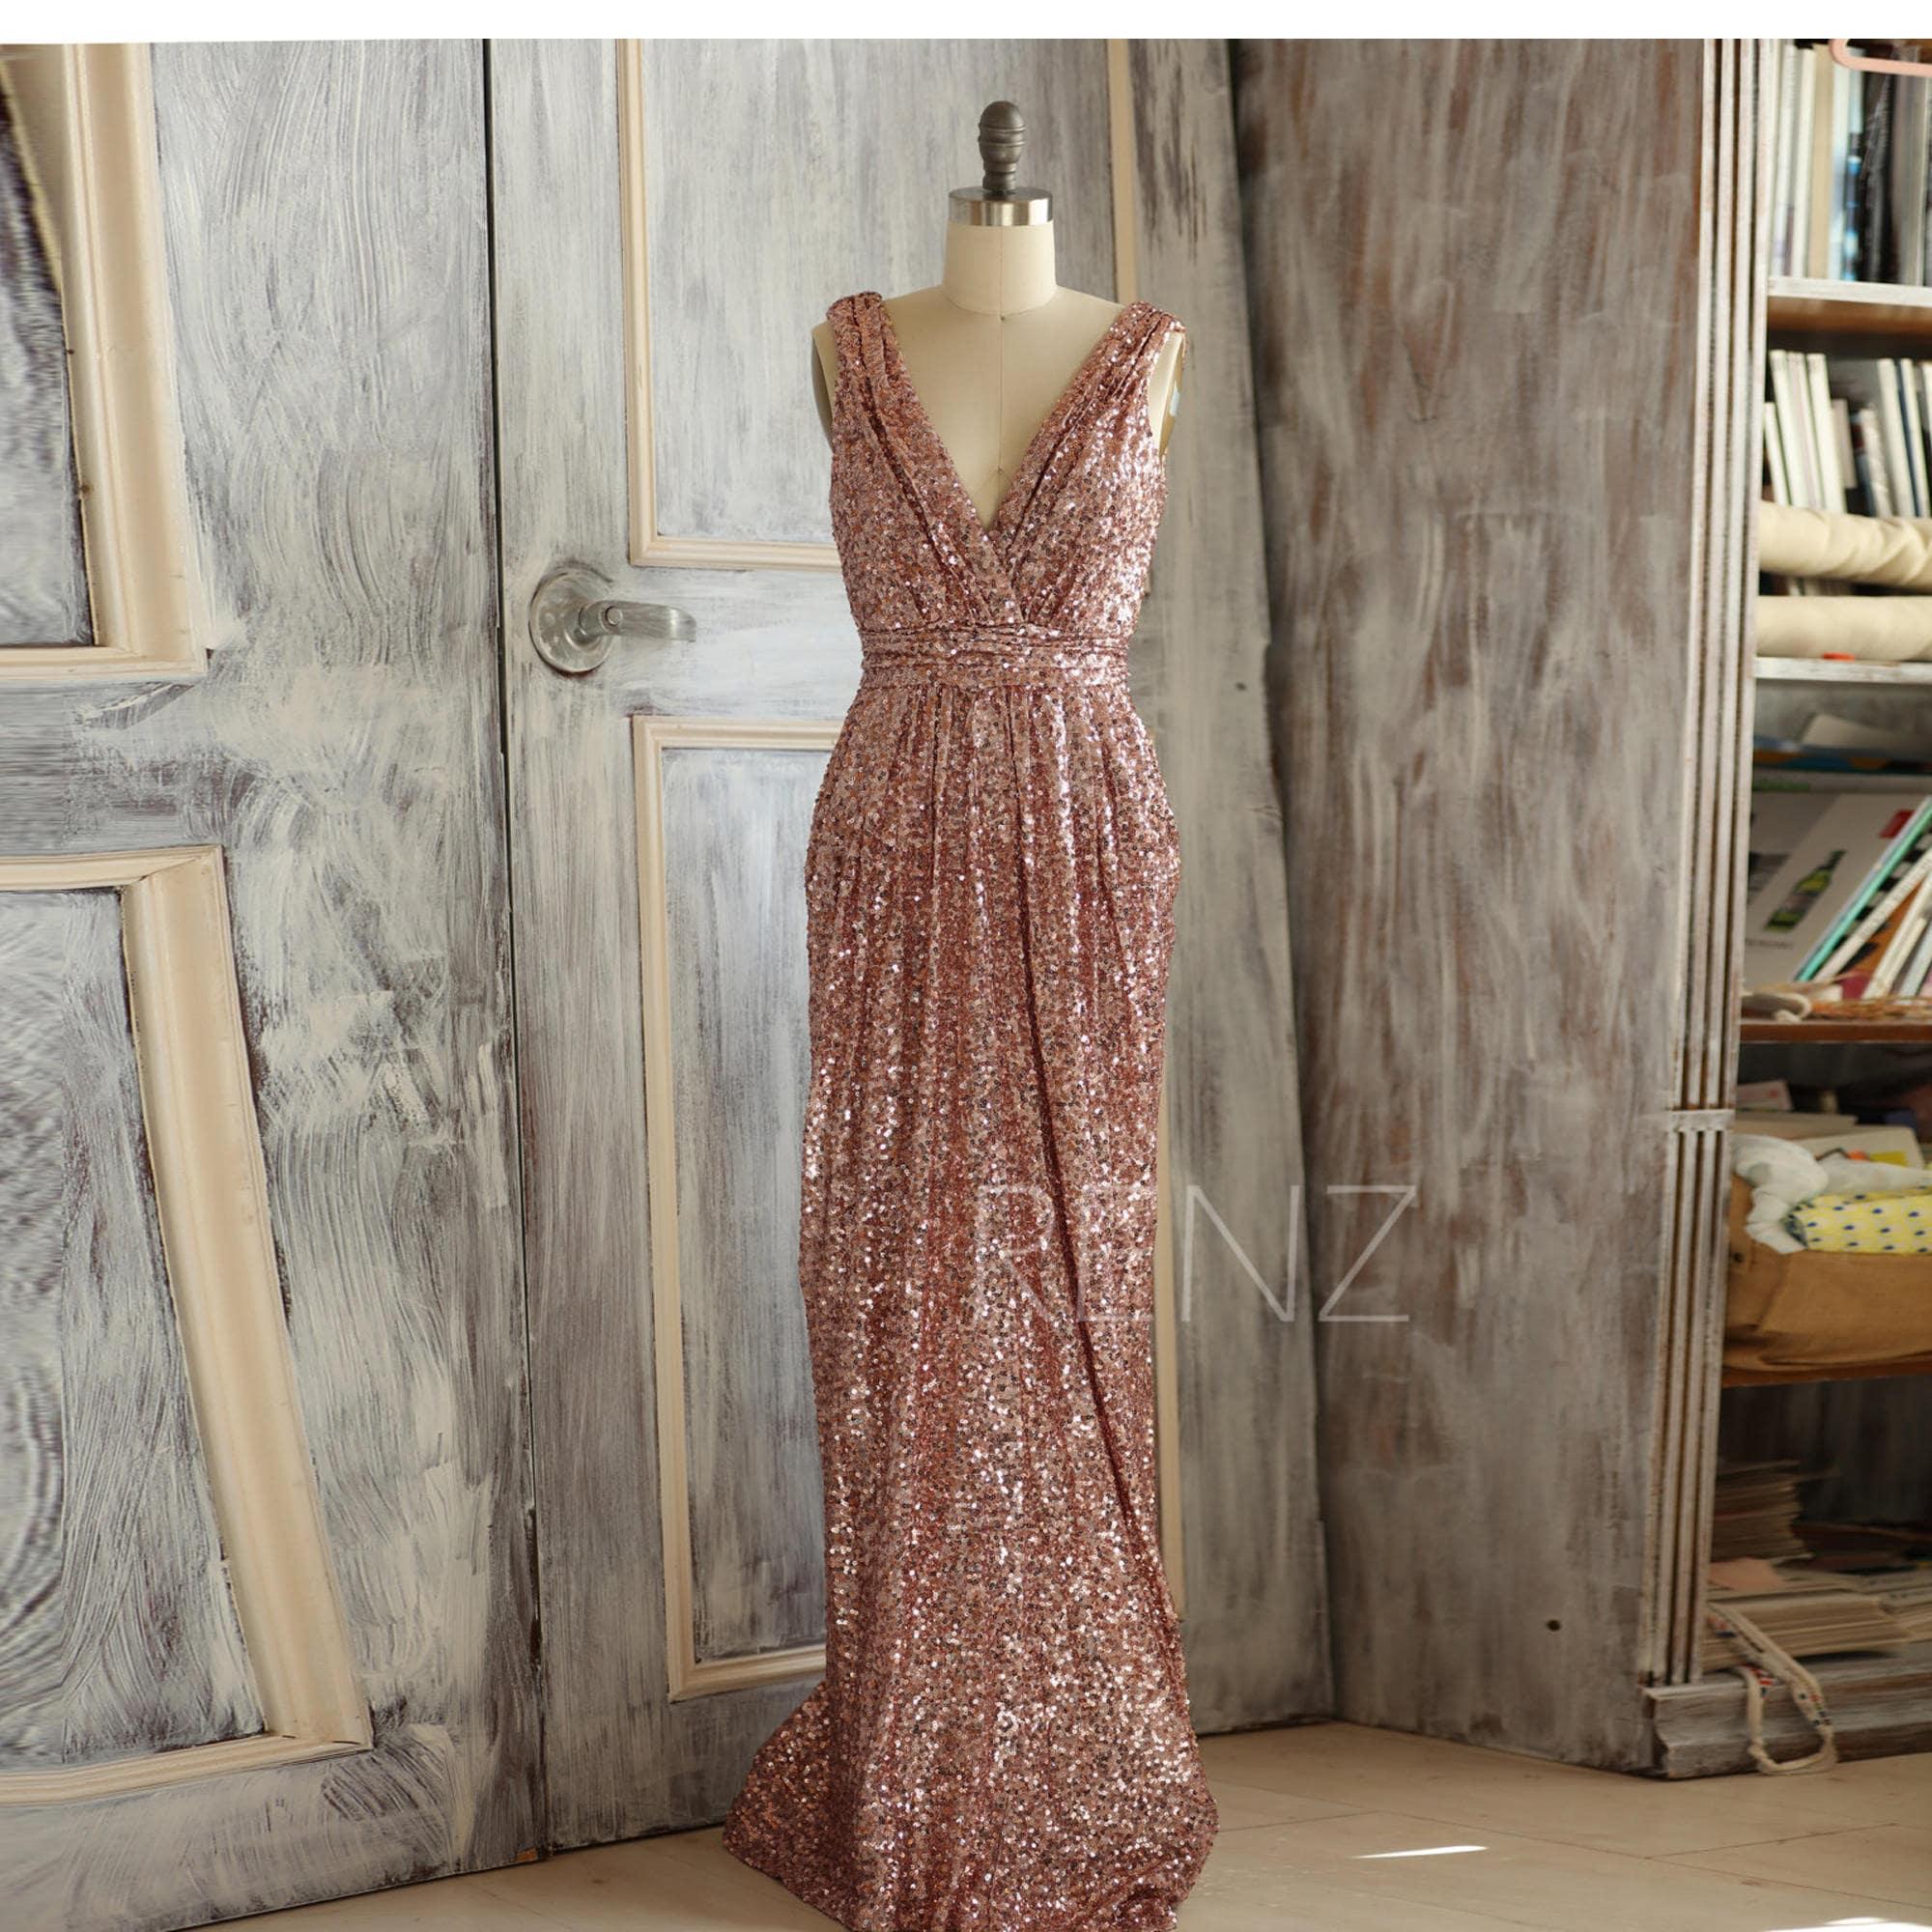 85604ff89b4 Bridesmaid Dress Rose Gold Sequin Dress Wedding Dress Metallic